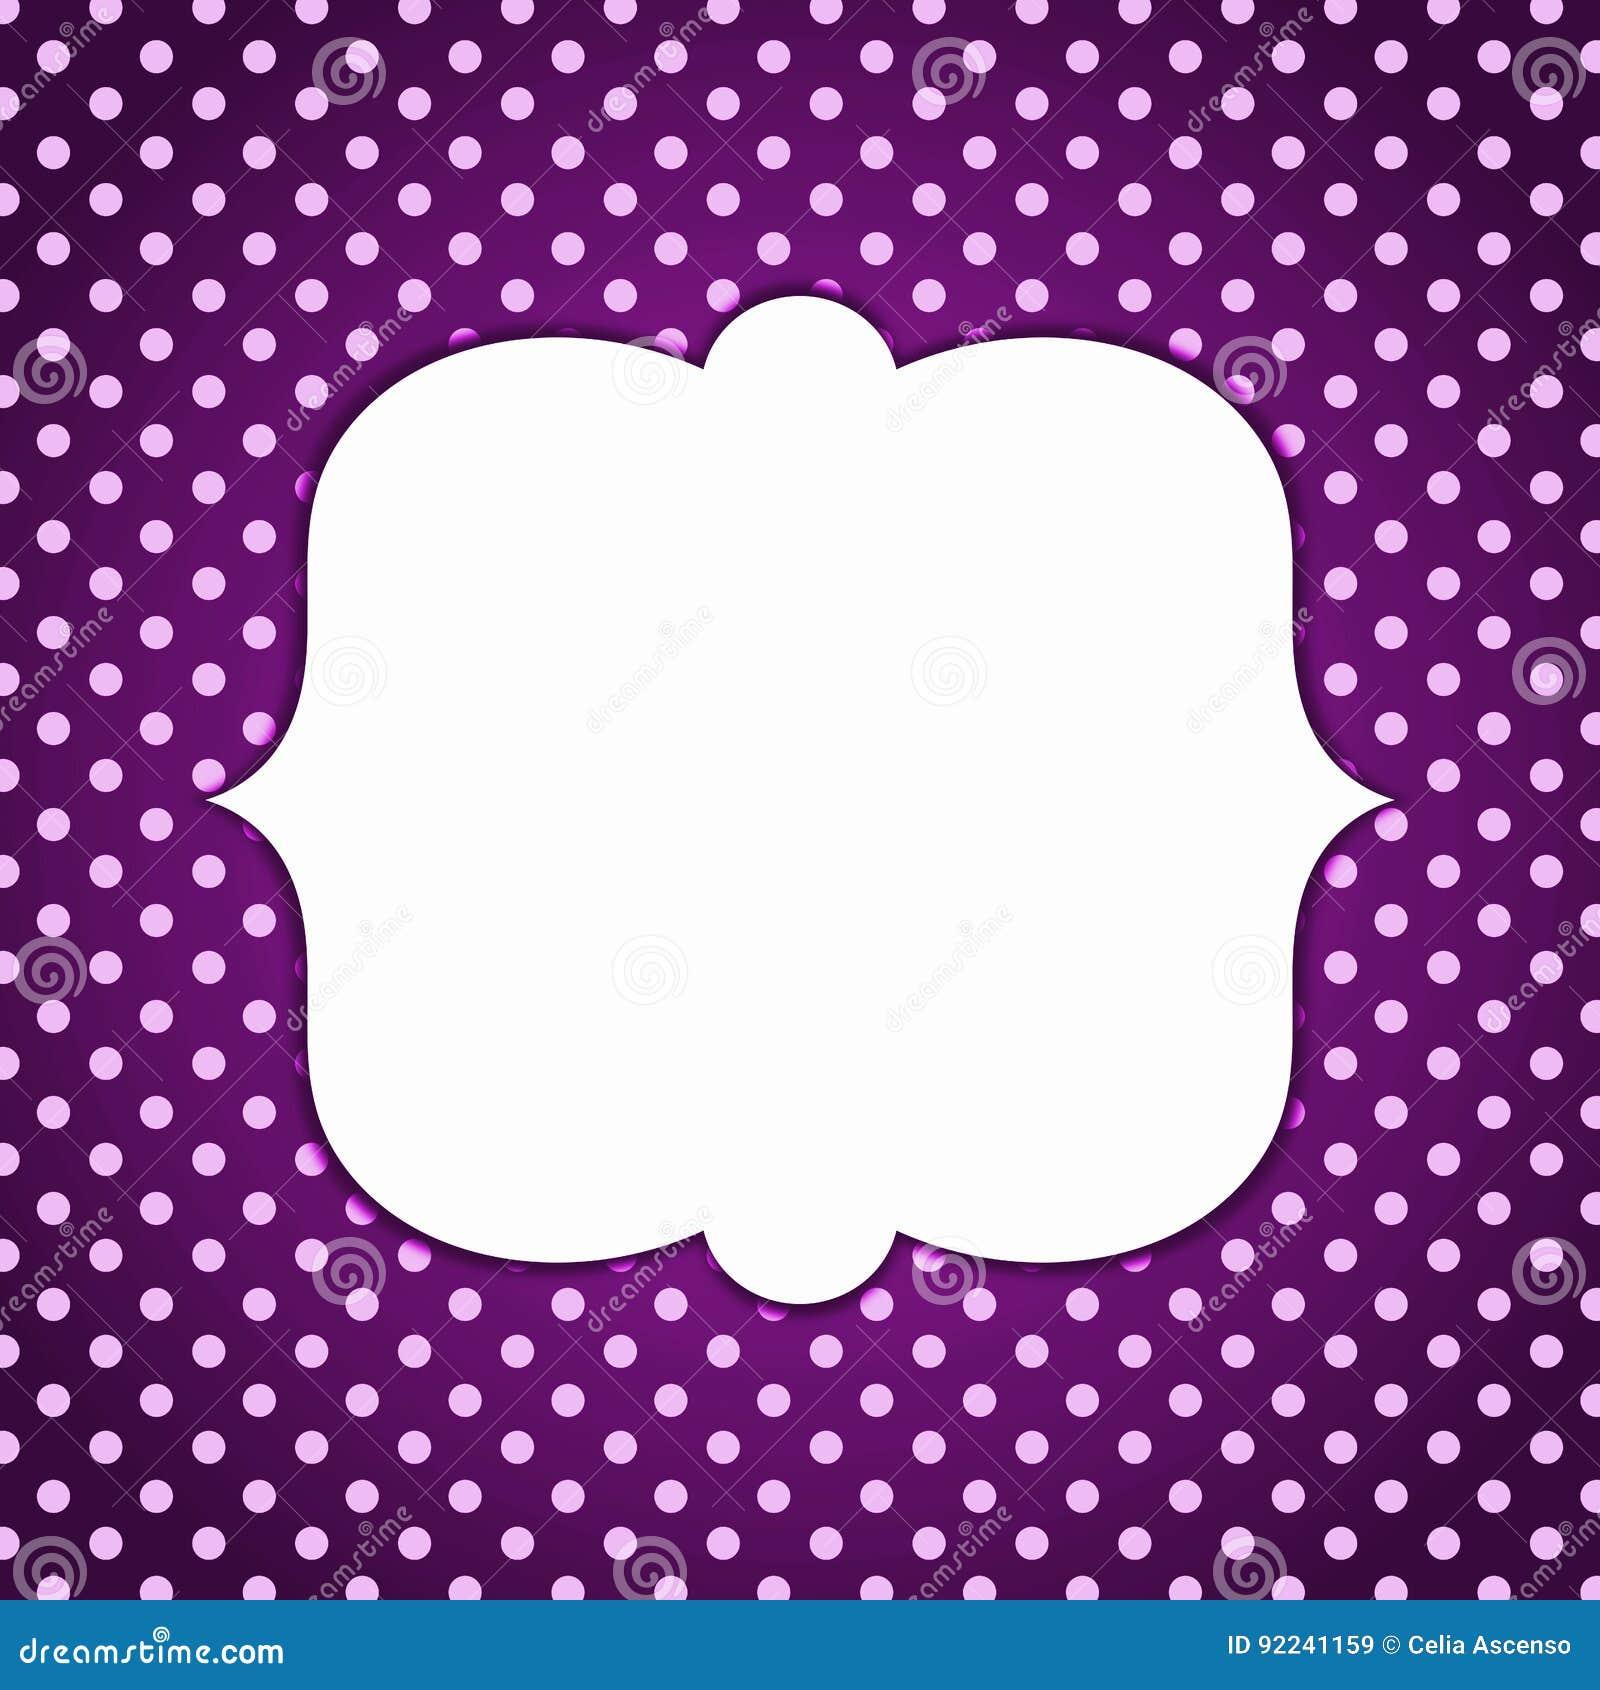 Polka dots vintage dark border frame